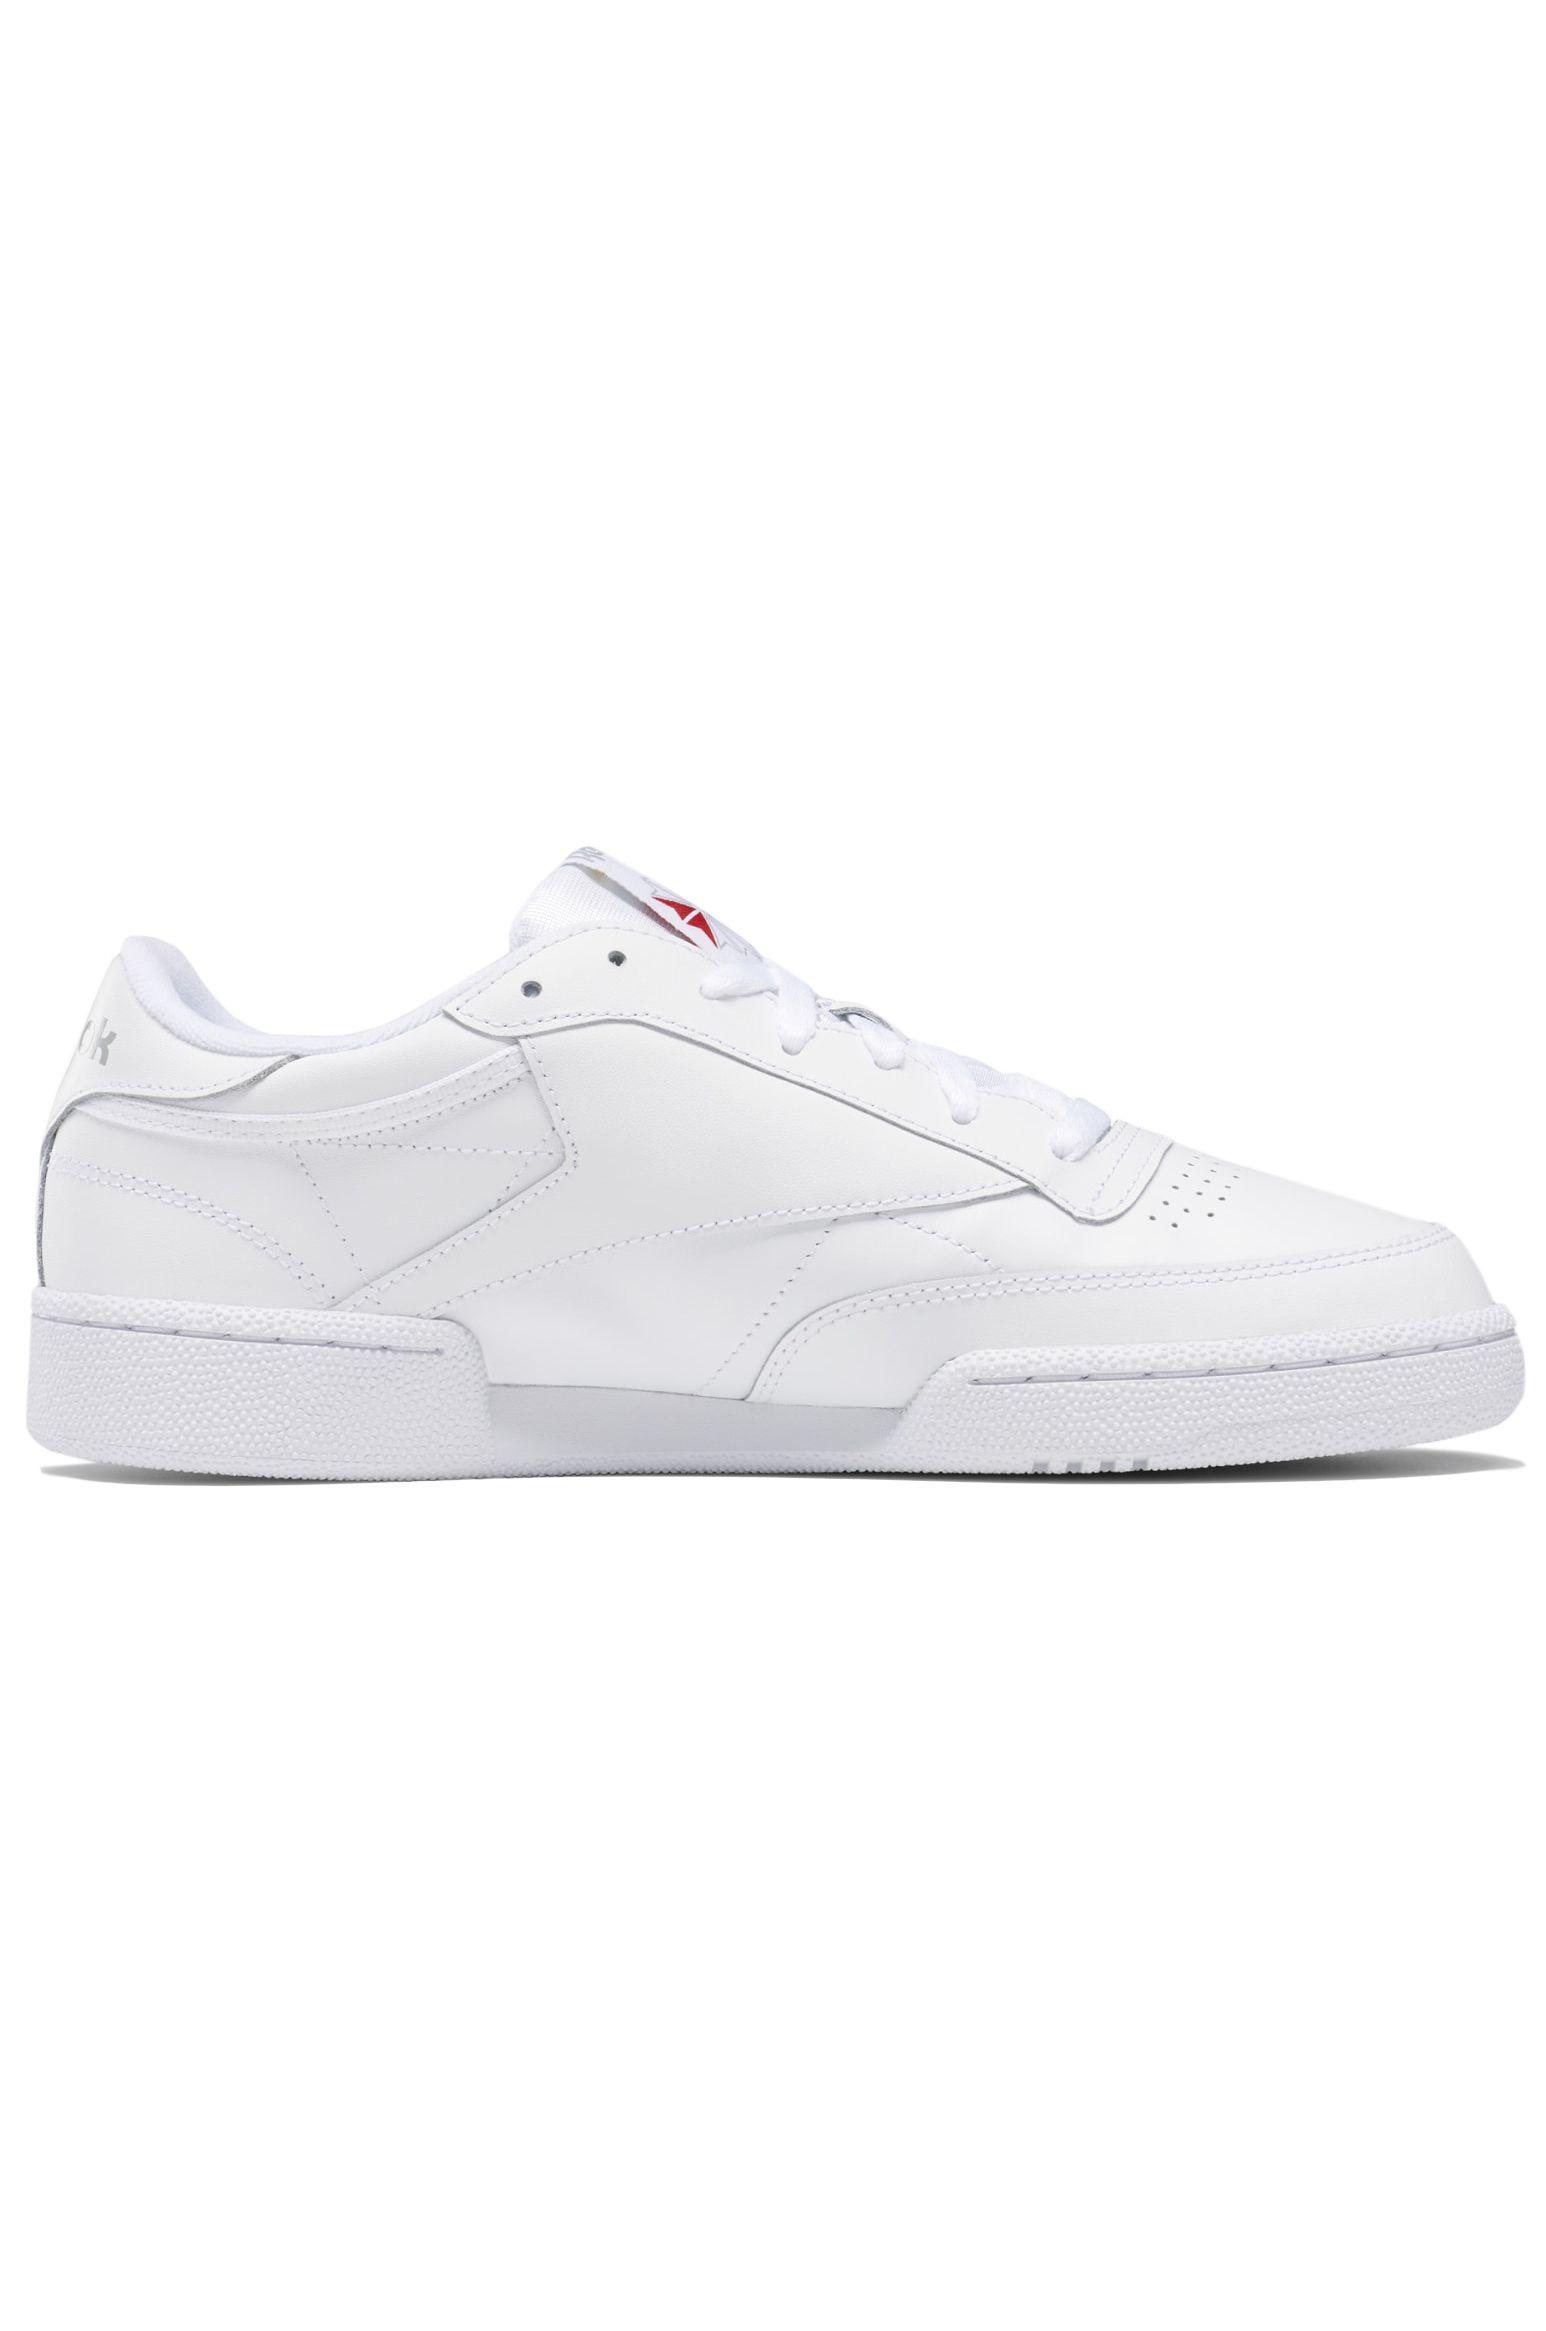 Tenis Reebok CLUB C 85 Int-White/Sheer Grey